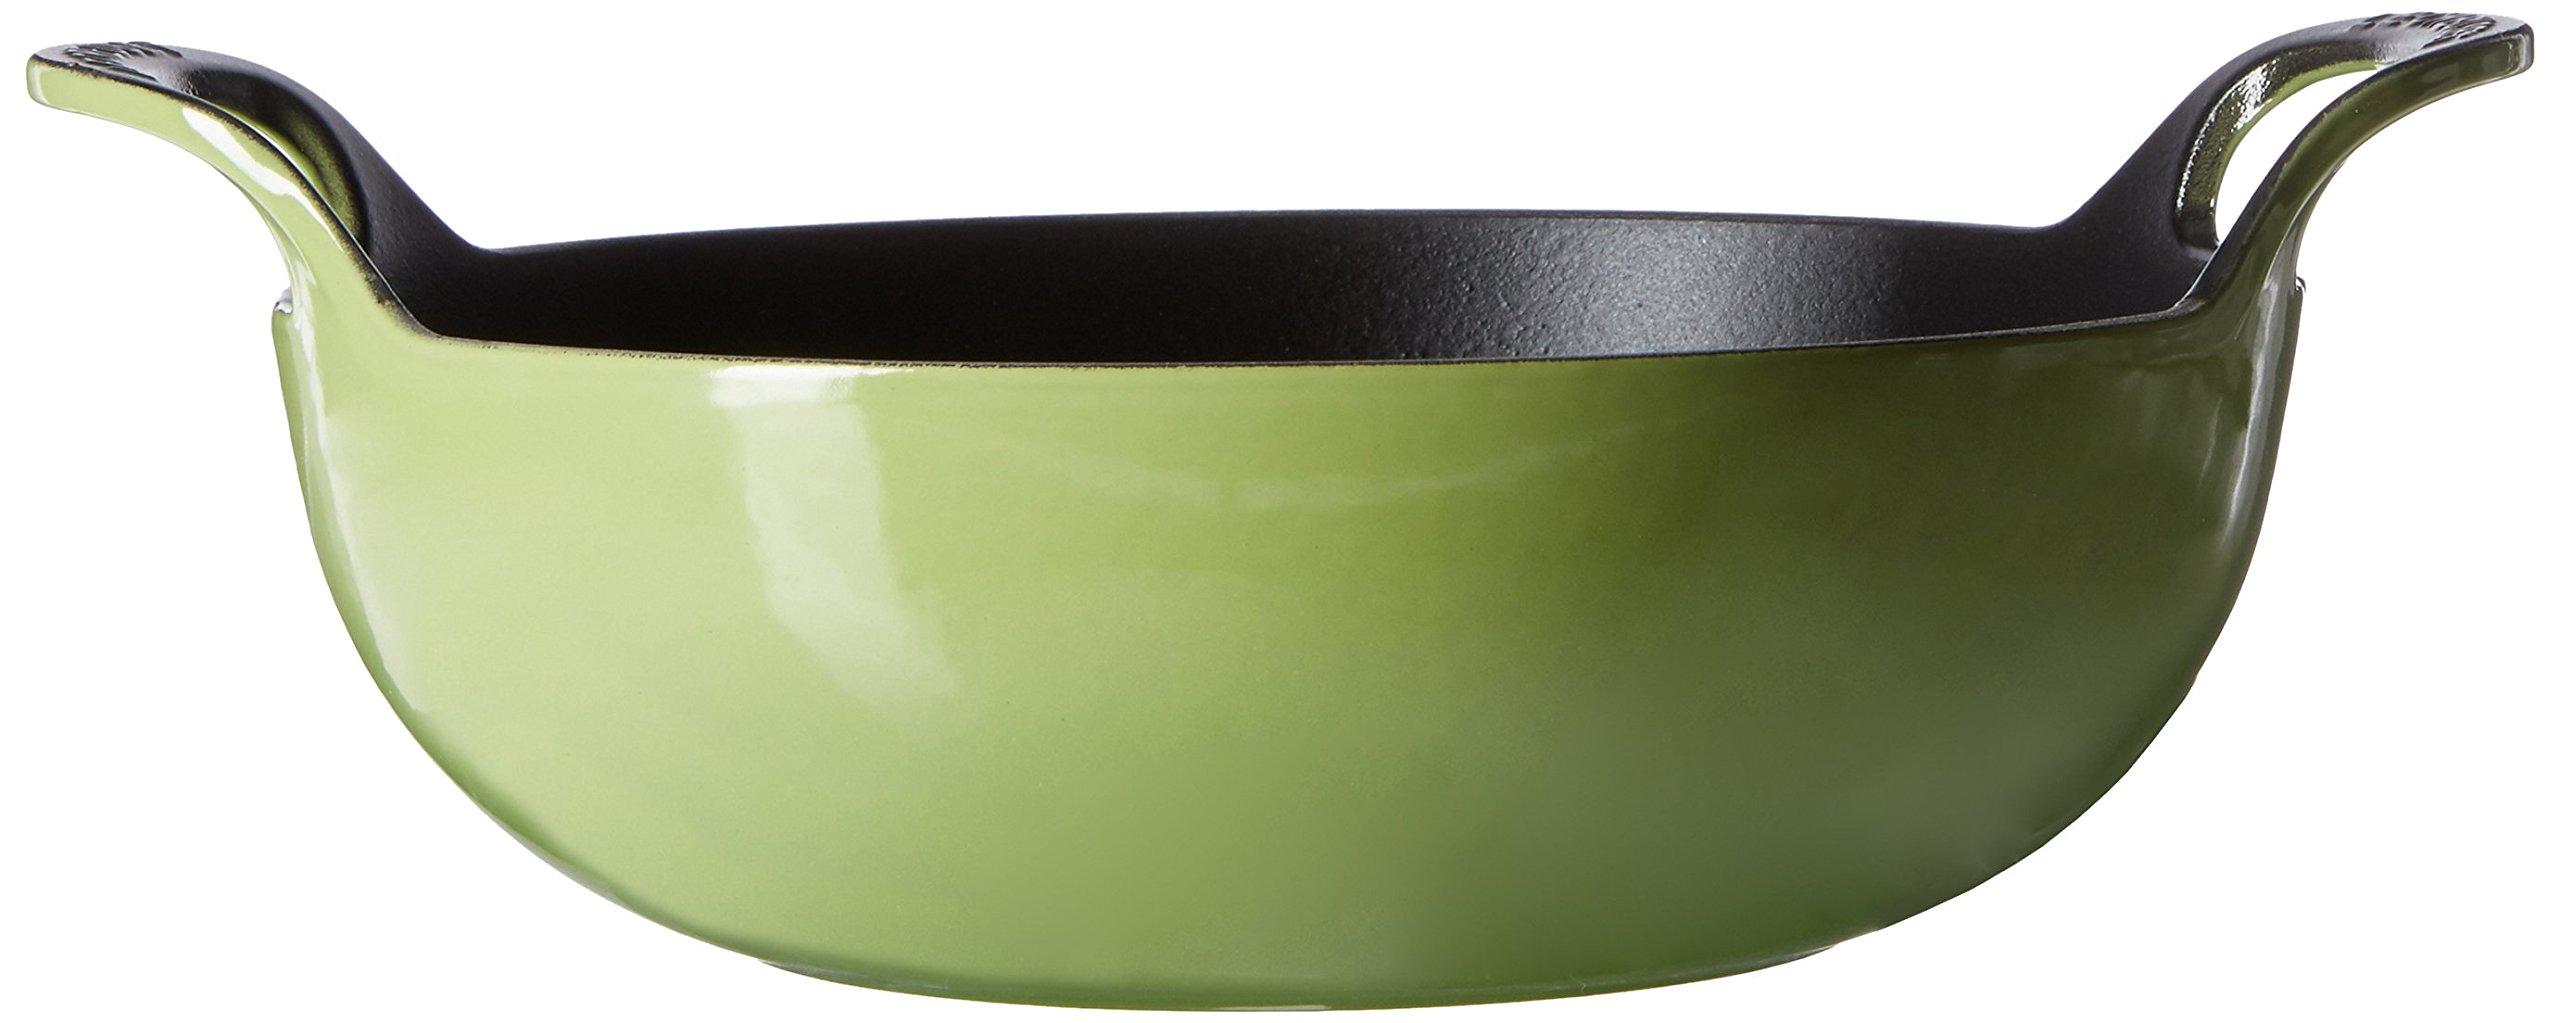 Le Creuset of America Enameled Cast Iron Balti Dish, 3-Quart, Palm